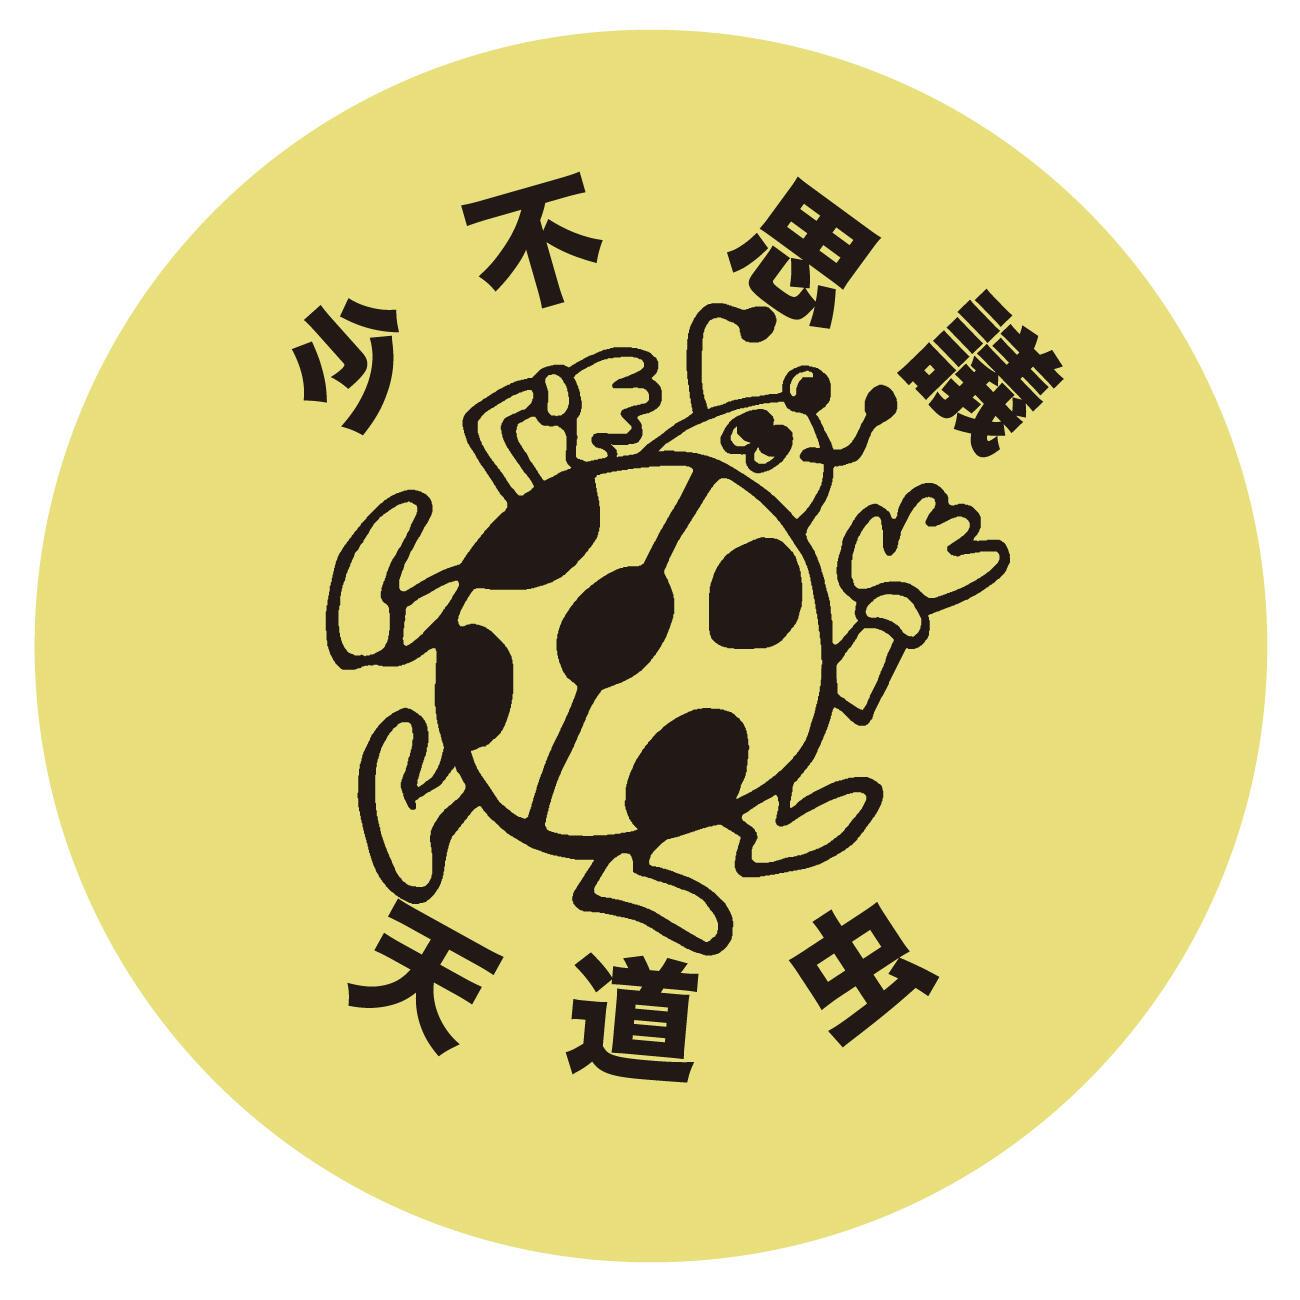 Ladybug_label_A_promo.jpg